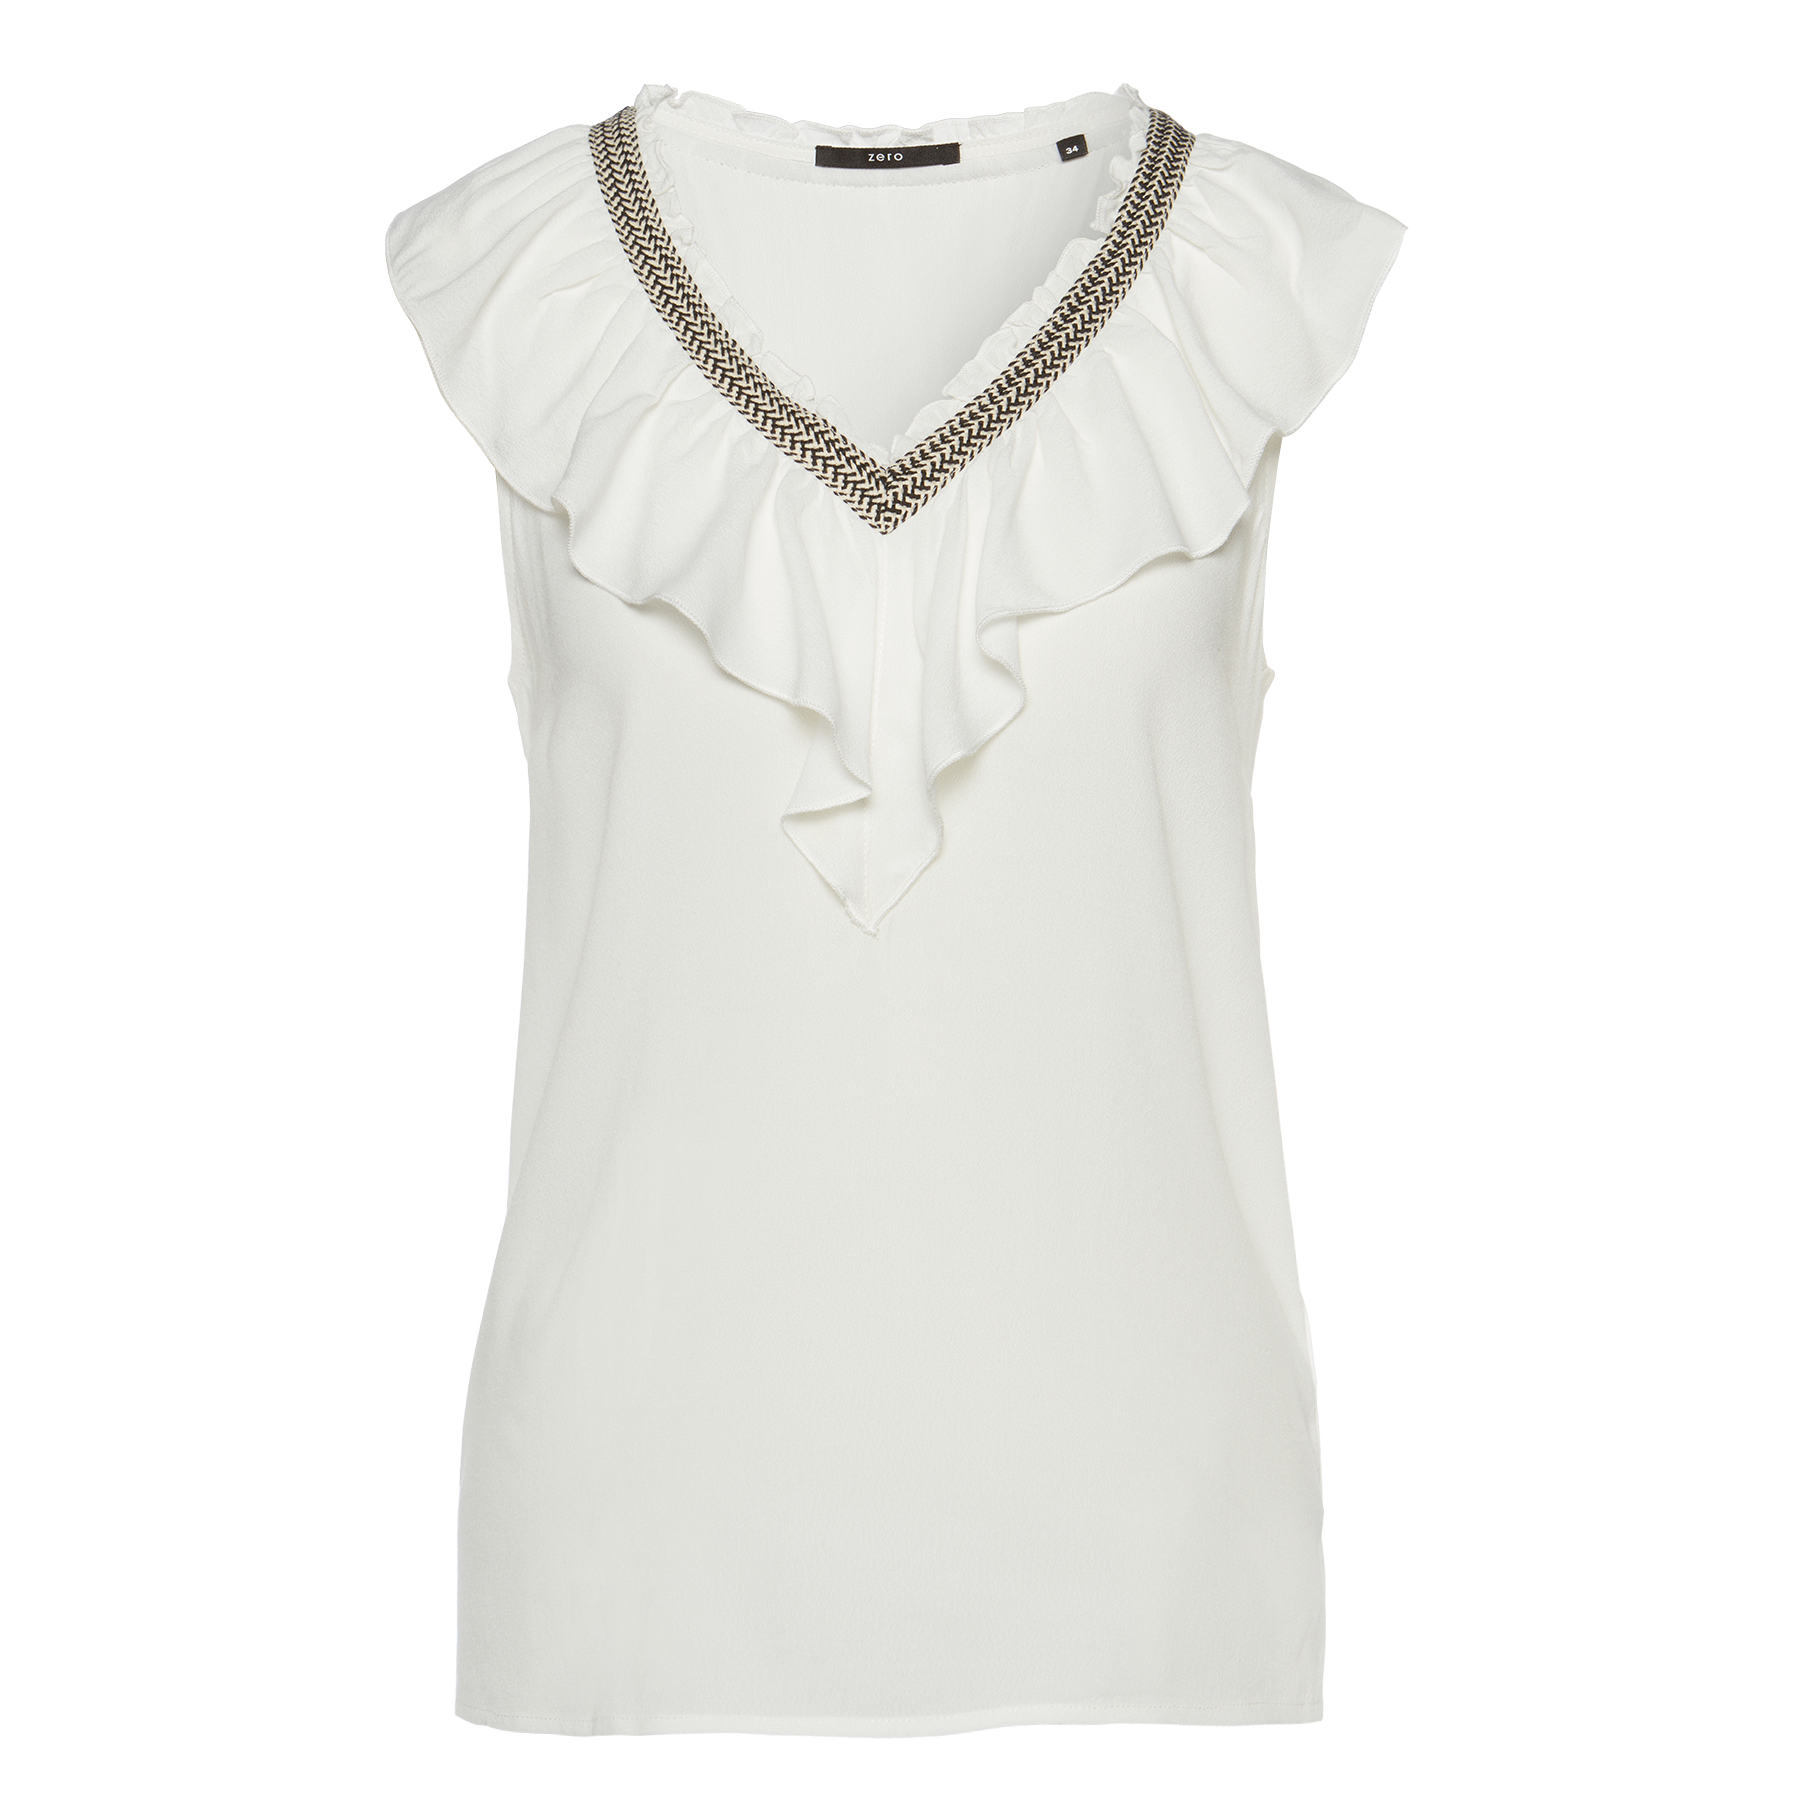 Bluse mit Volant-Blende offwhite